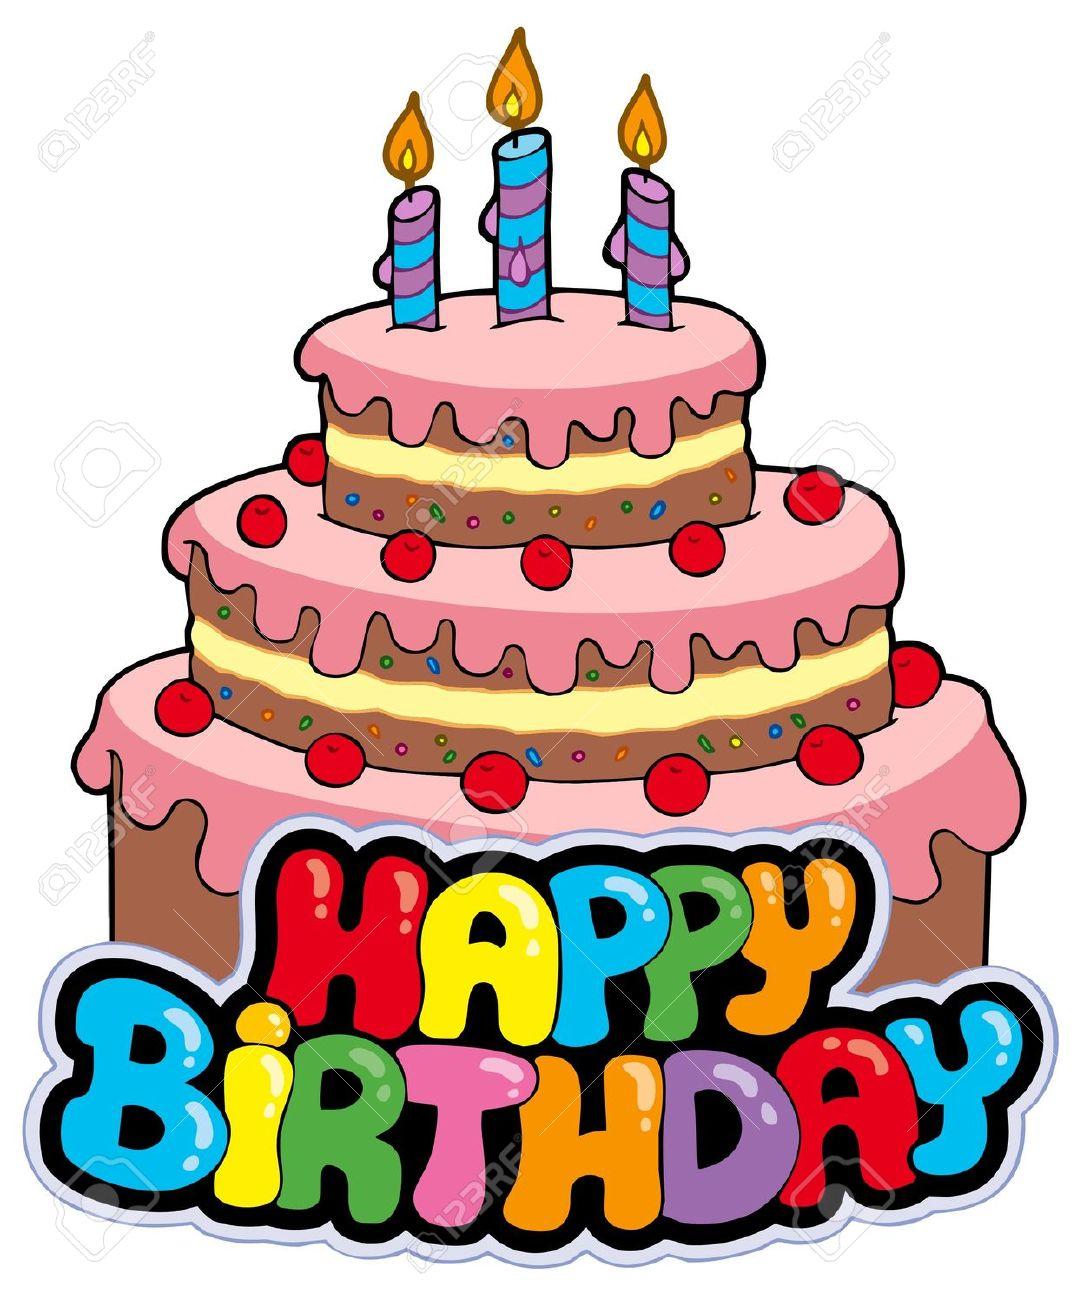 Happy birthday torte clipart.